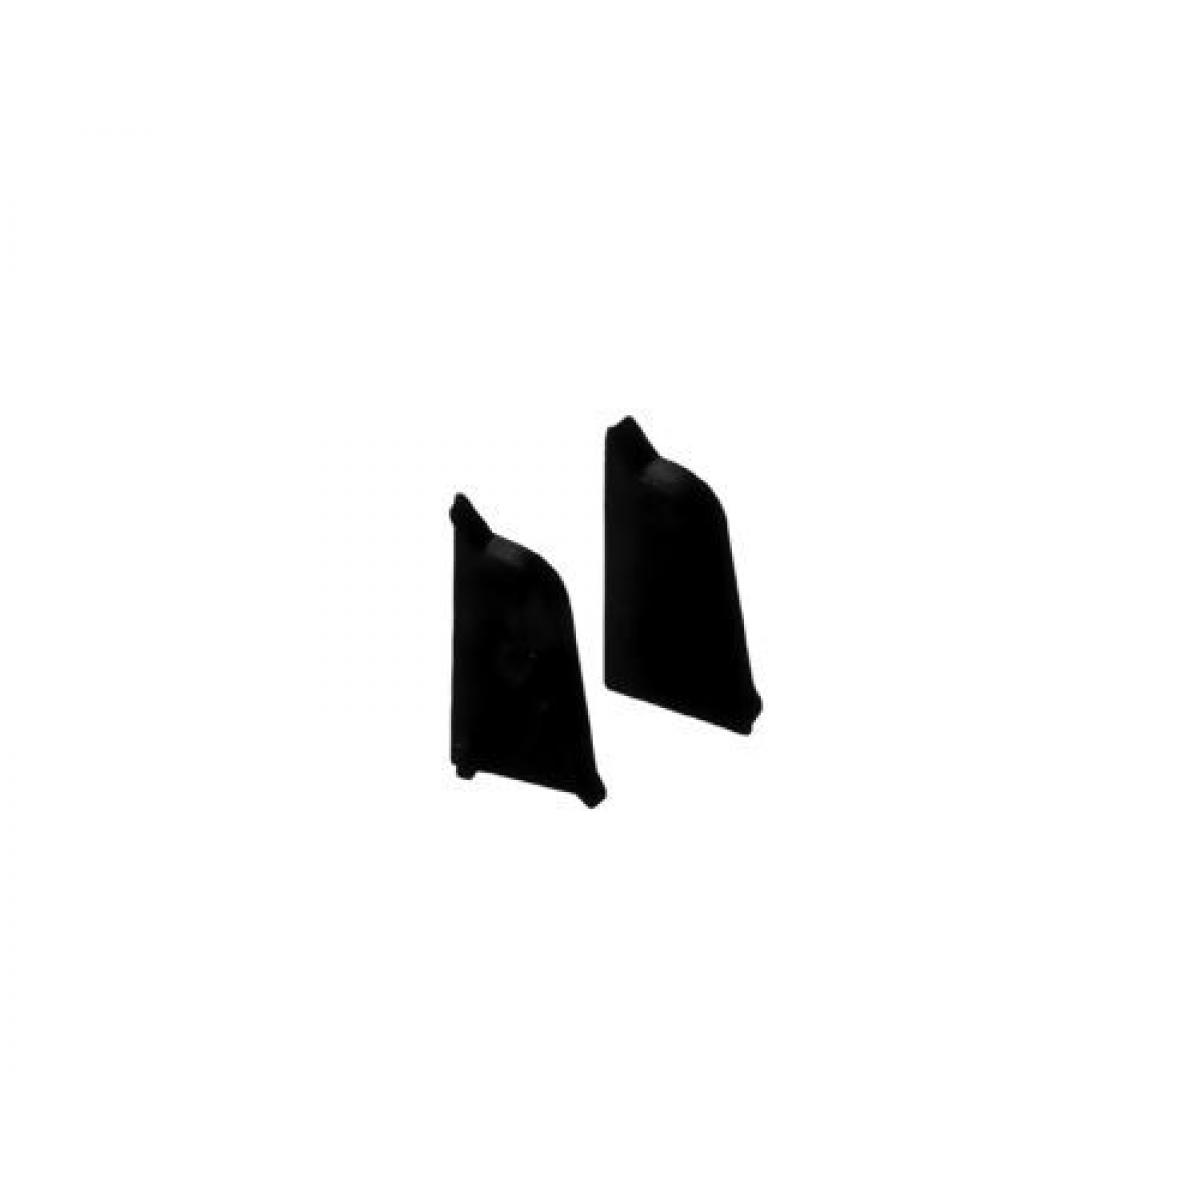 Комплект заглушек к плинтусу столешницы TA8081, цвет серый